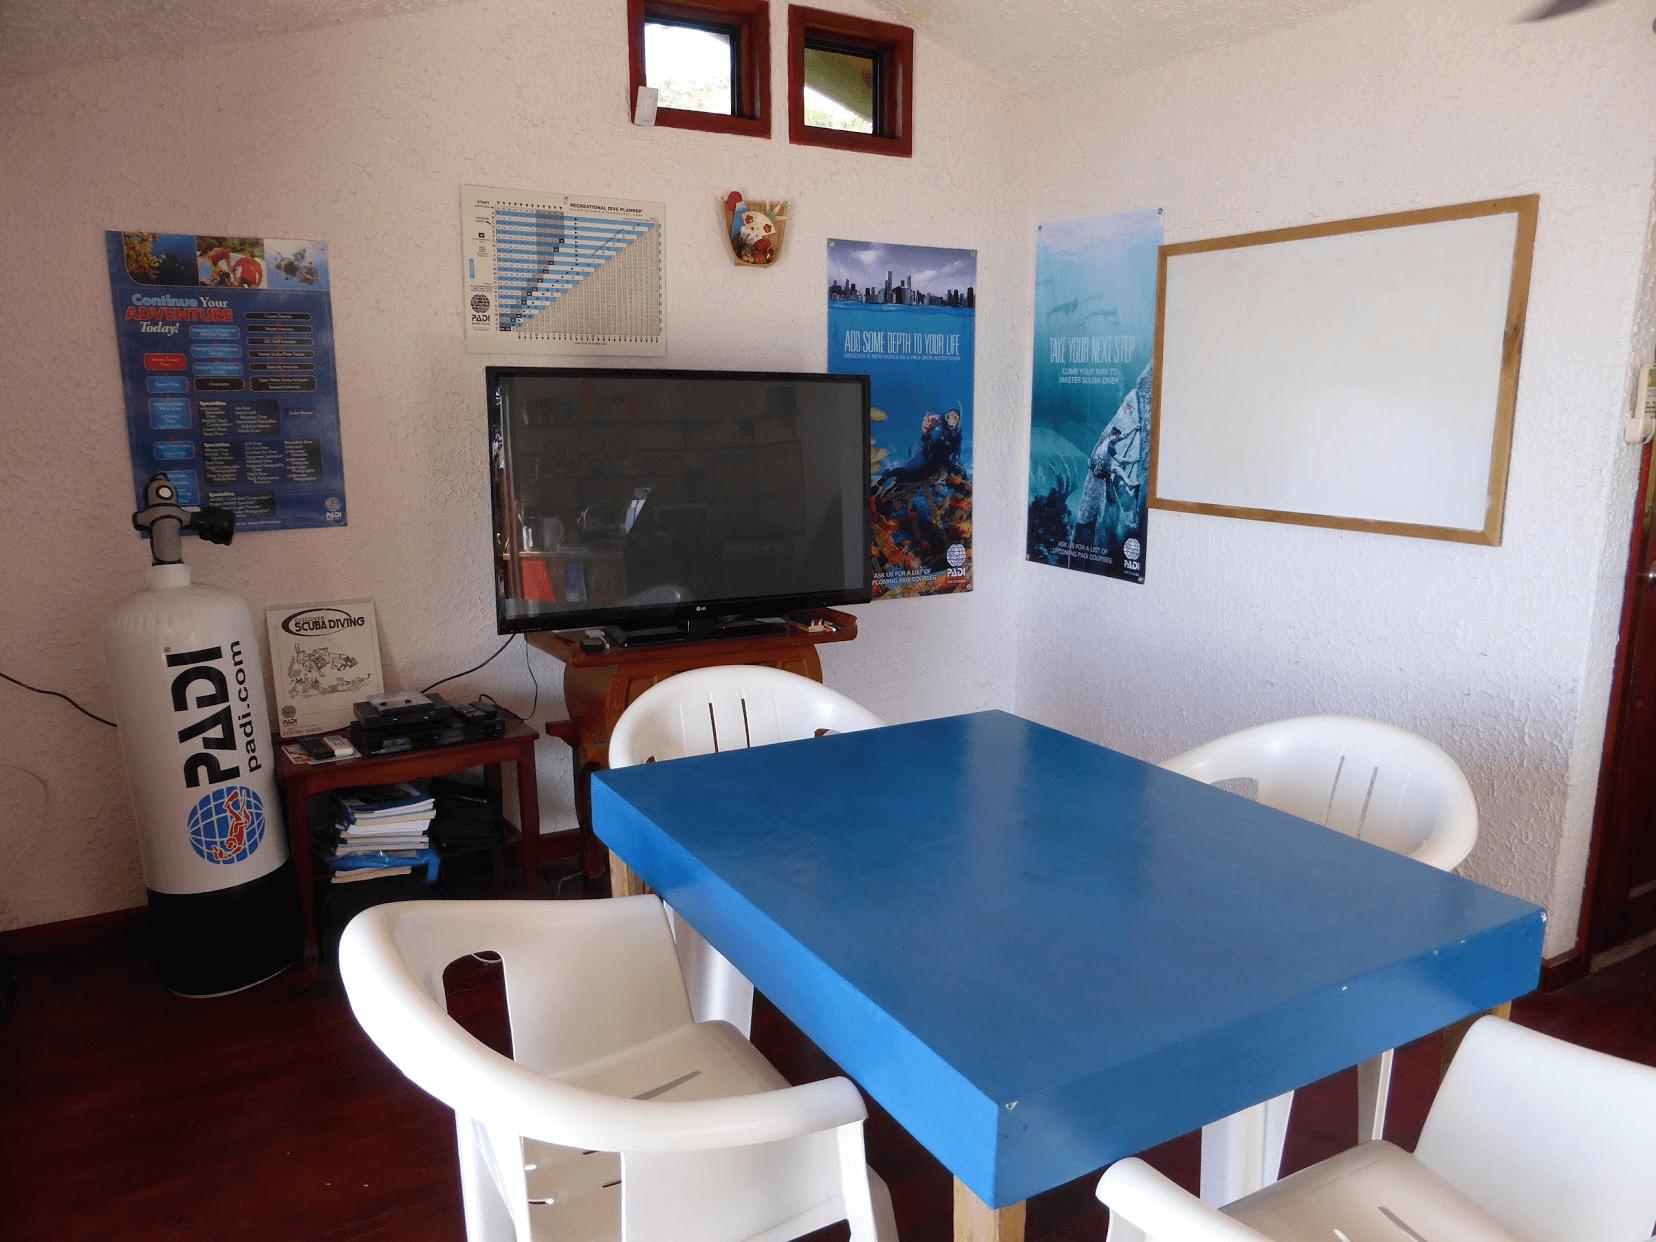 Roatan Divers classroom PADI courses